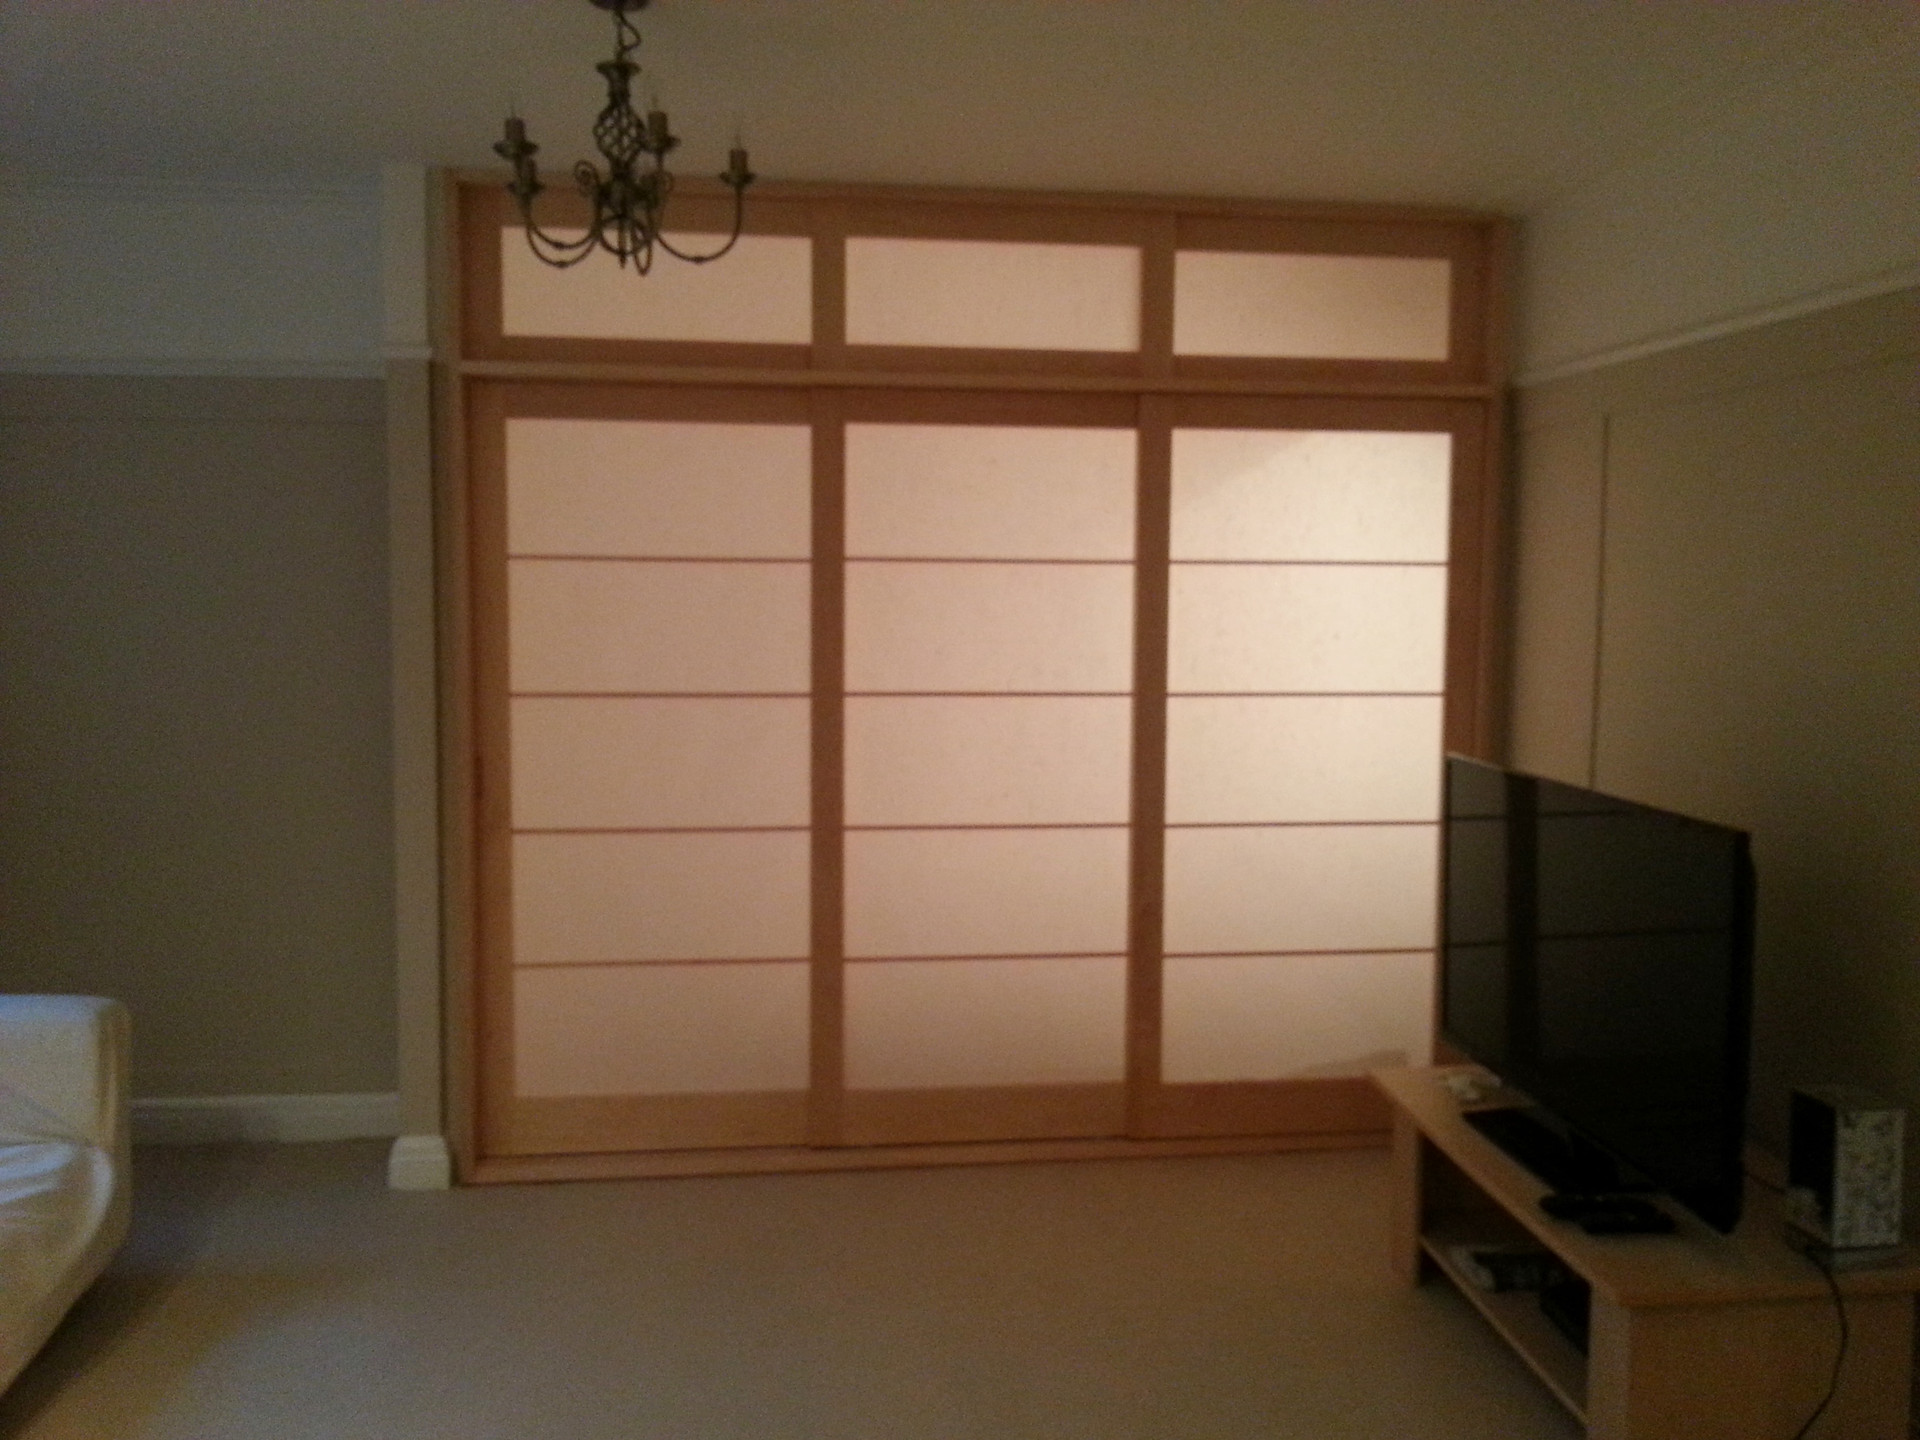 Bedroom Screen della-Porta design